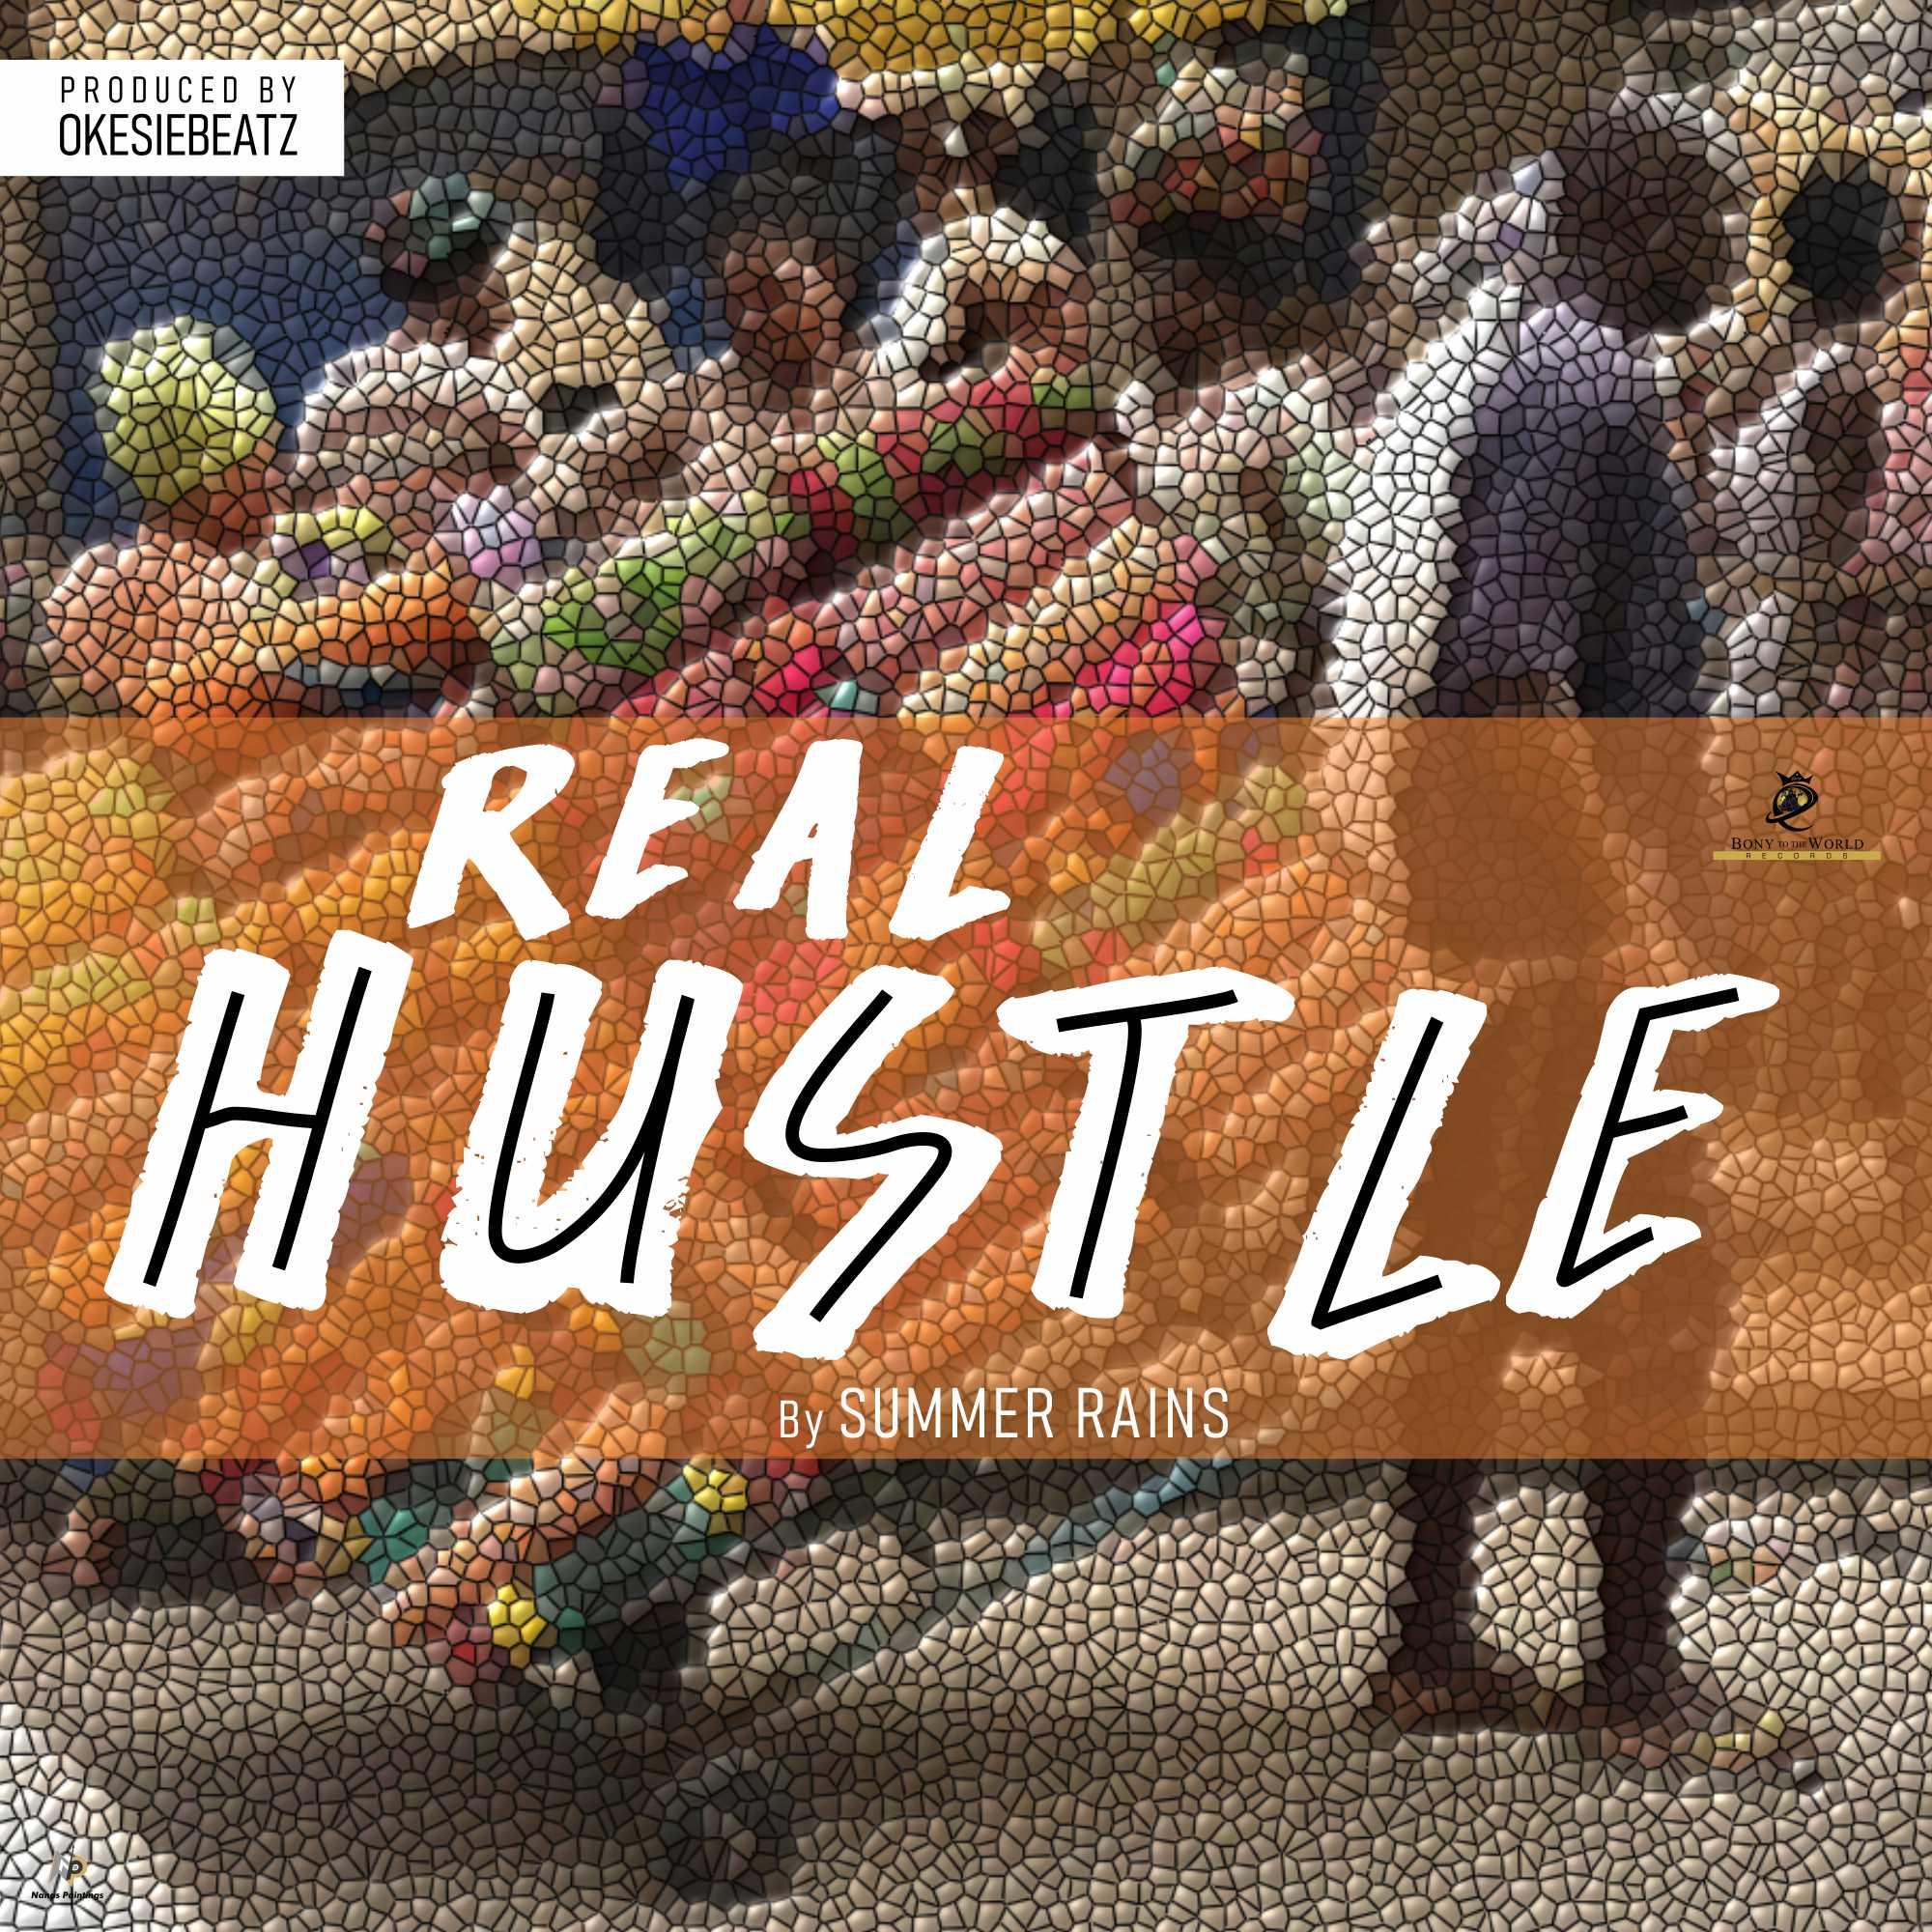 Summer Rains - Real Hustle